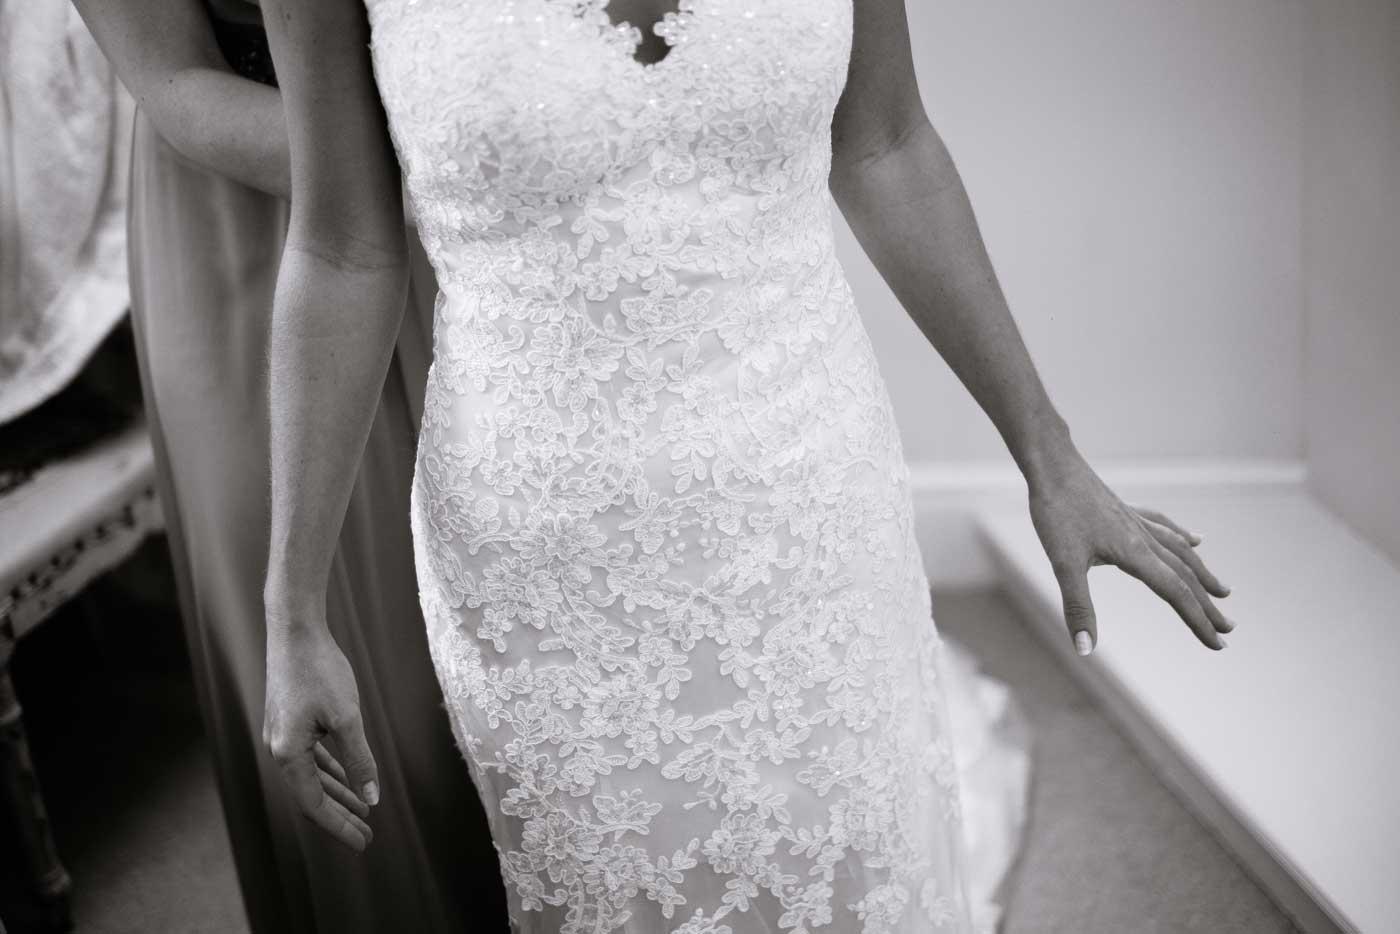 Close-up of bride's dress